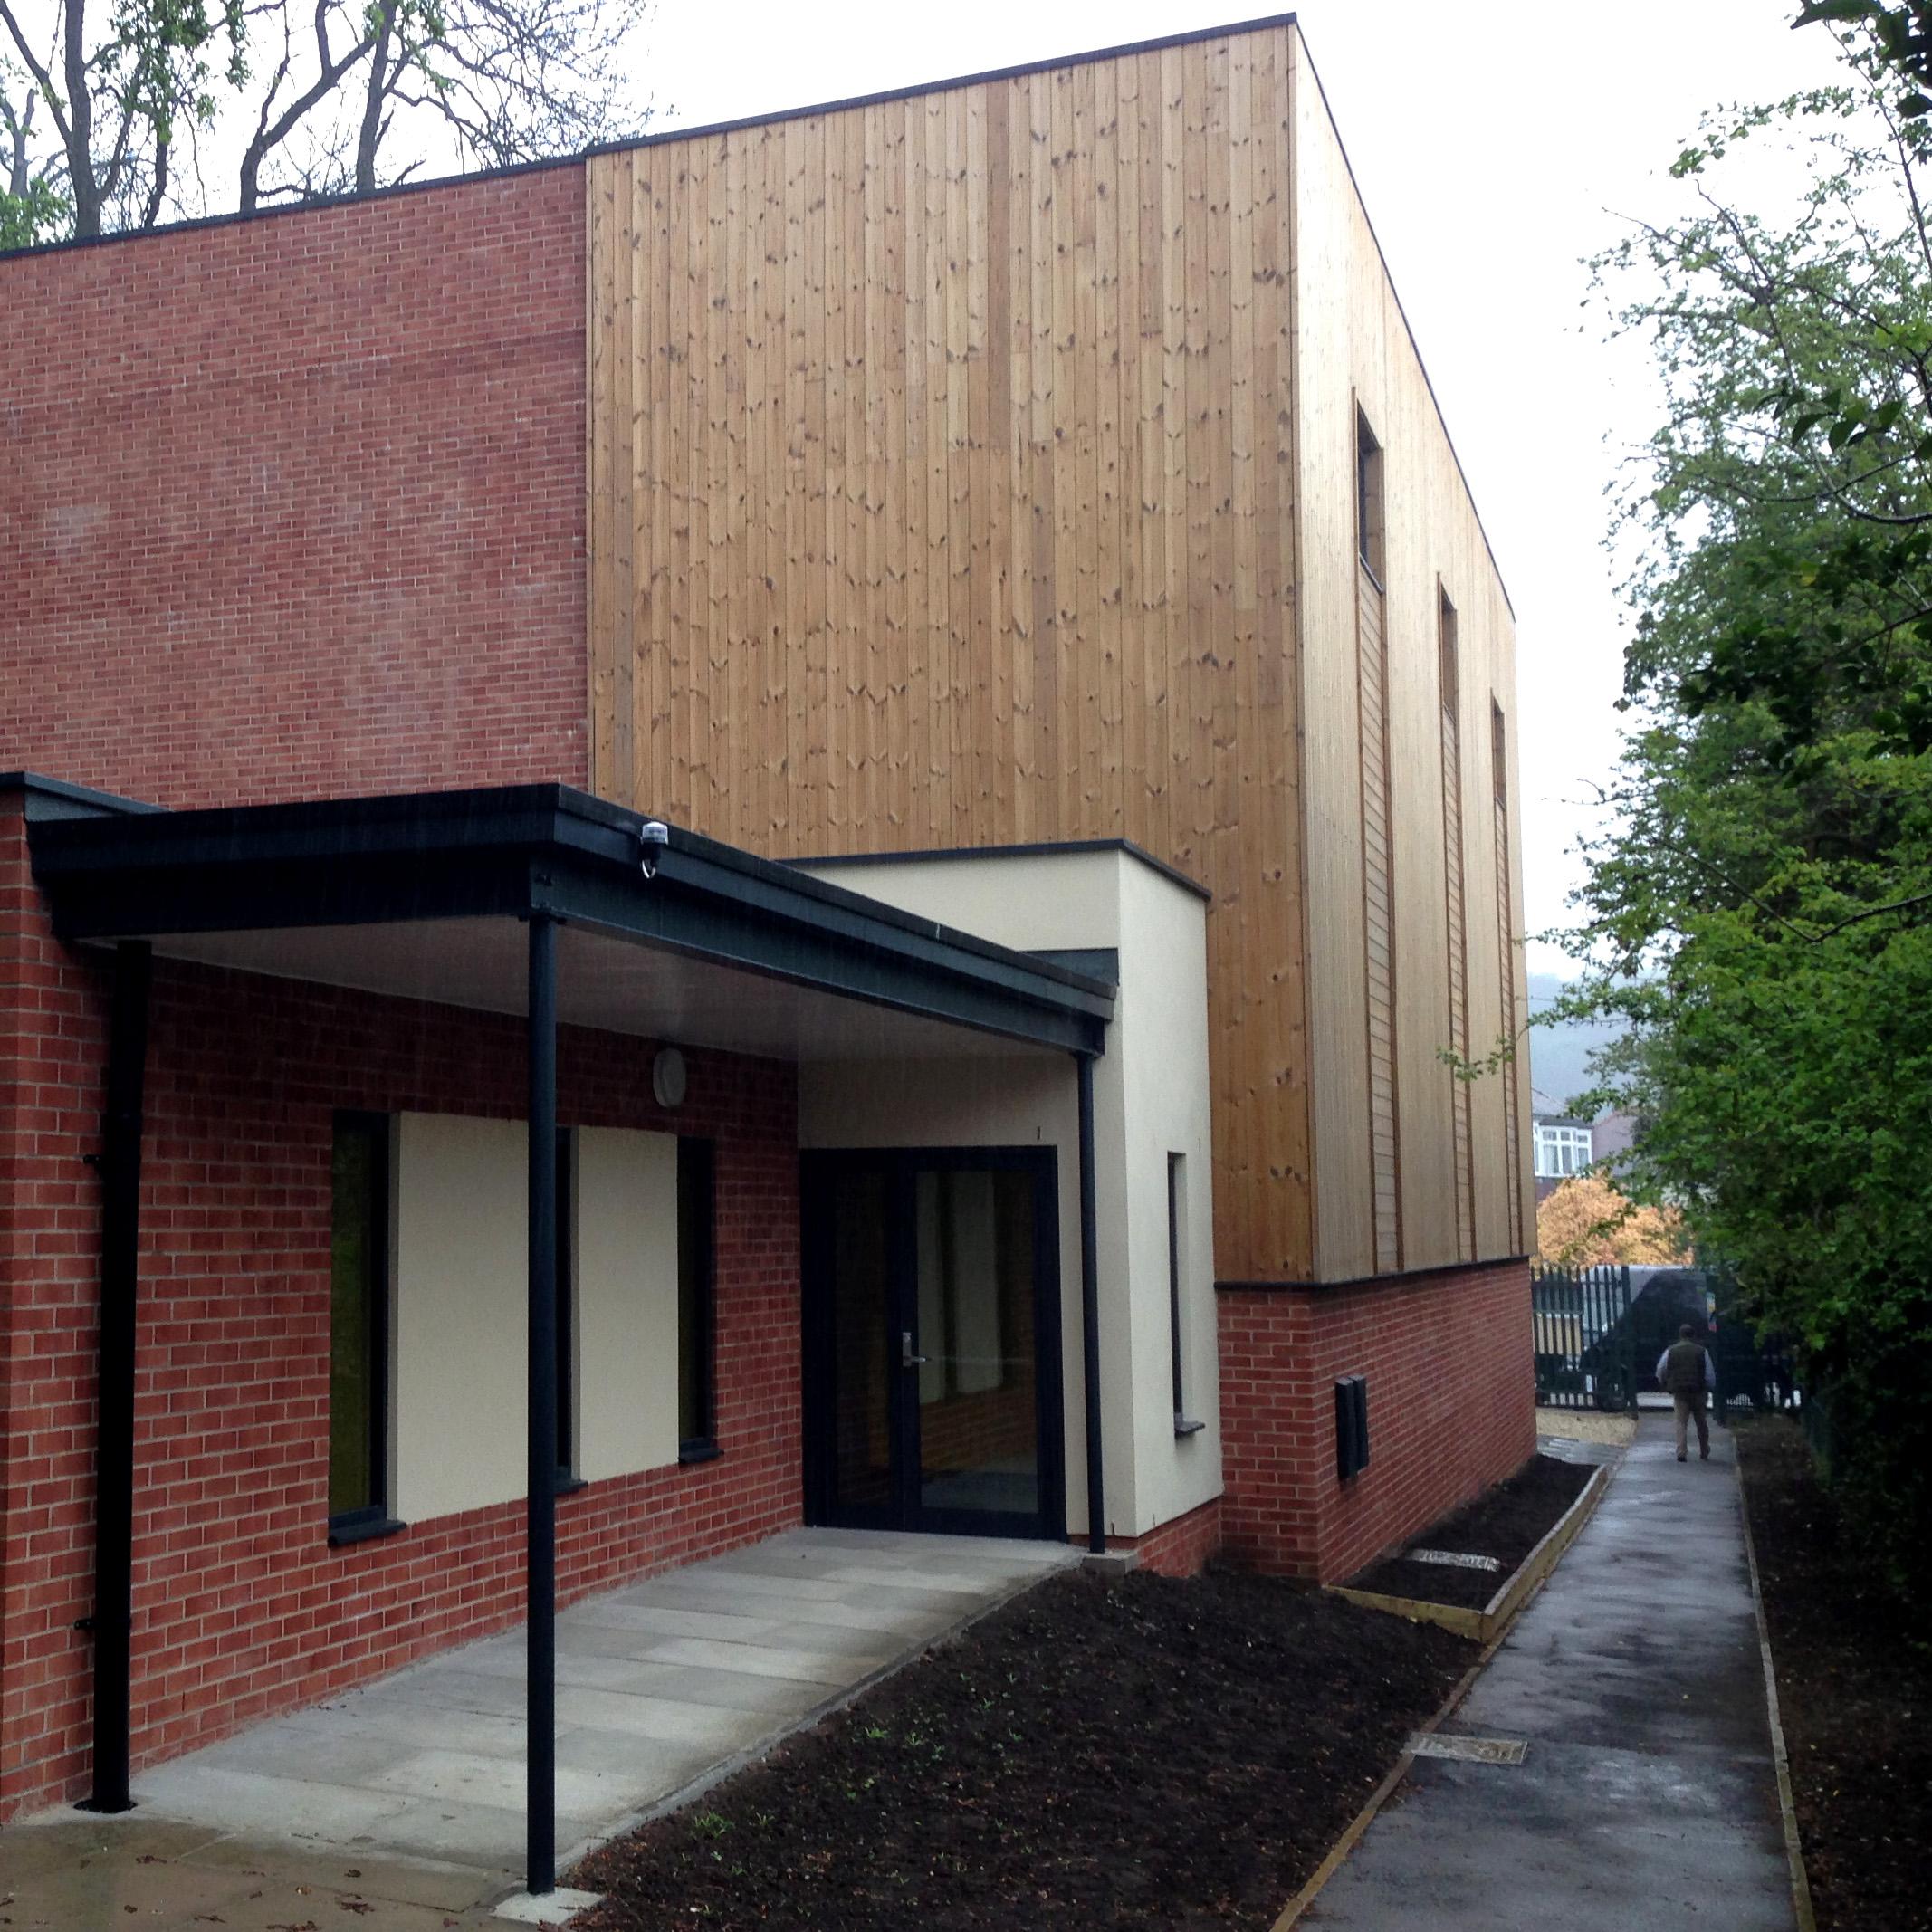 Social: St Wilfrid's, New Sports Hall